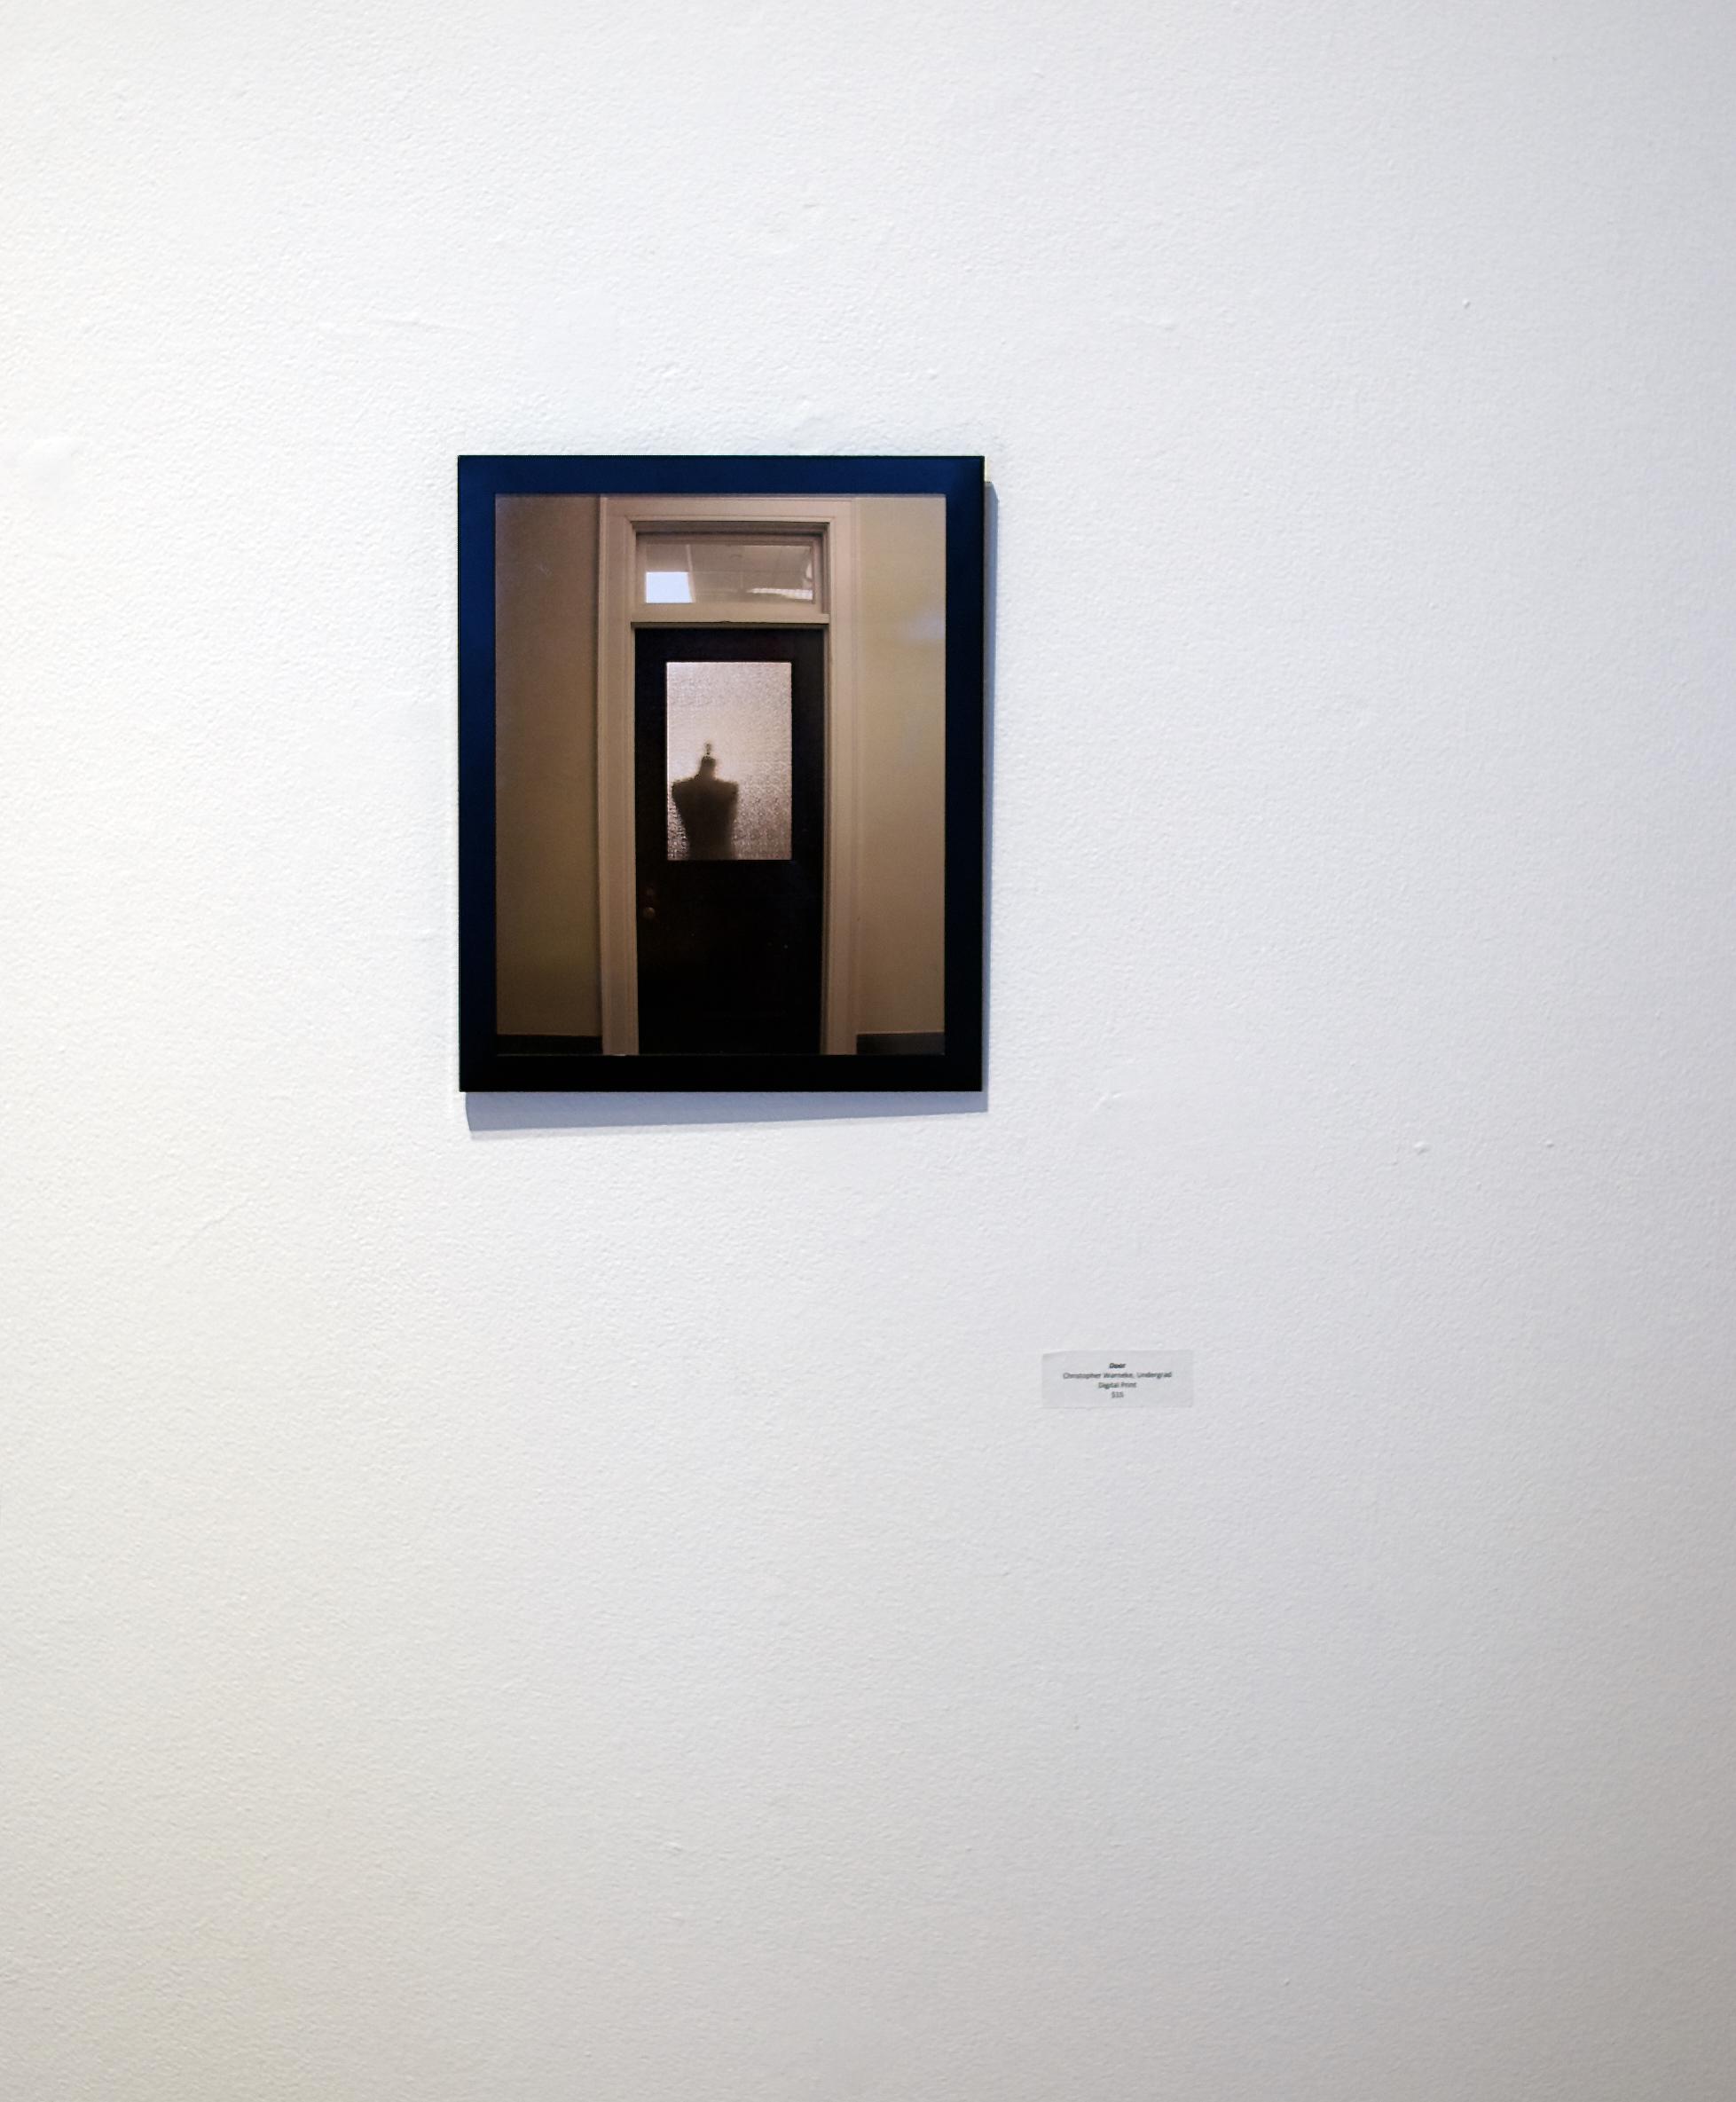 Frames. Memorial Union. Madison, Wisconsin. April 2012. © William D. Walker